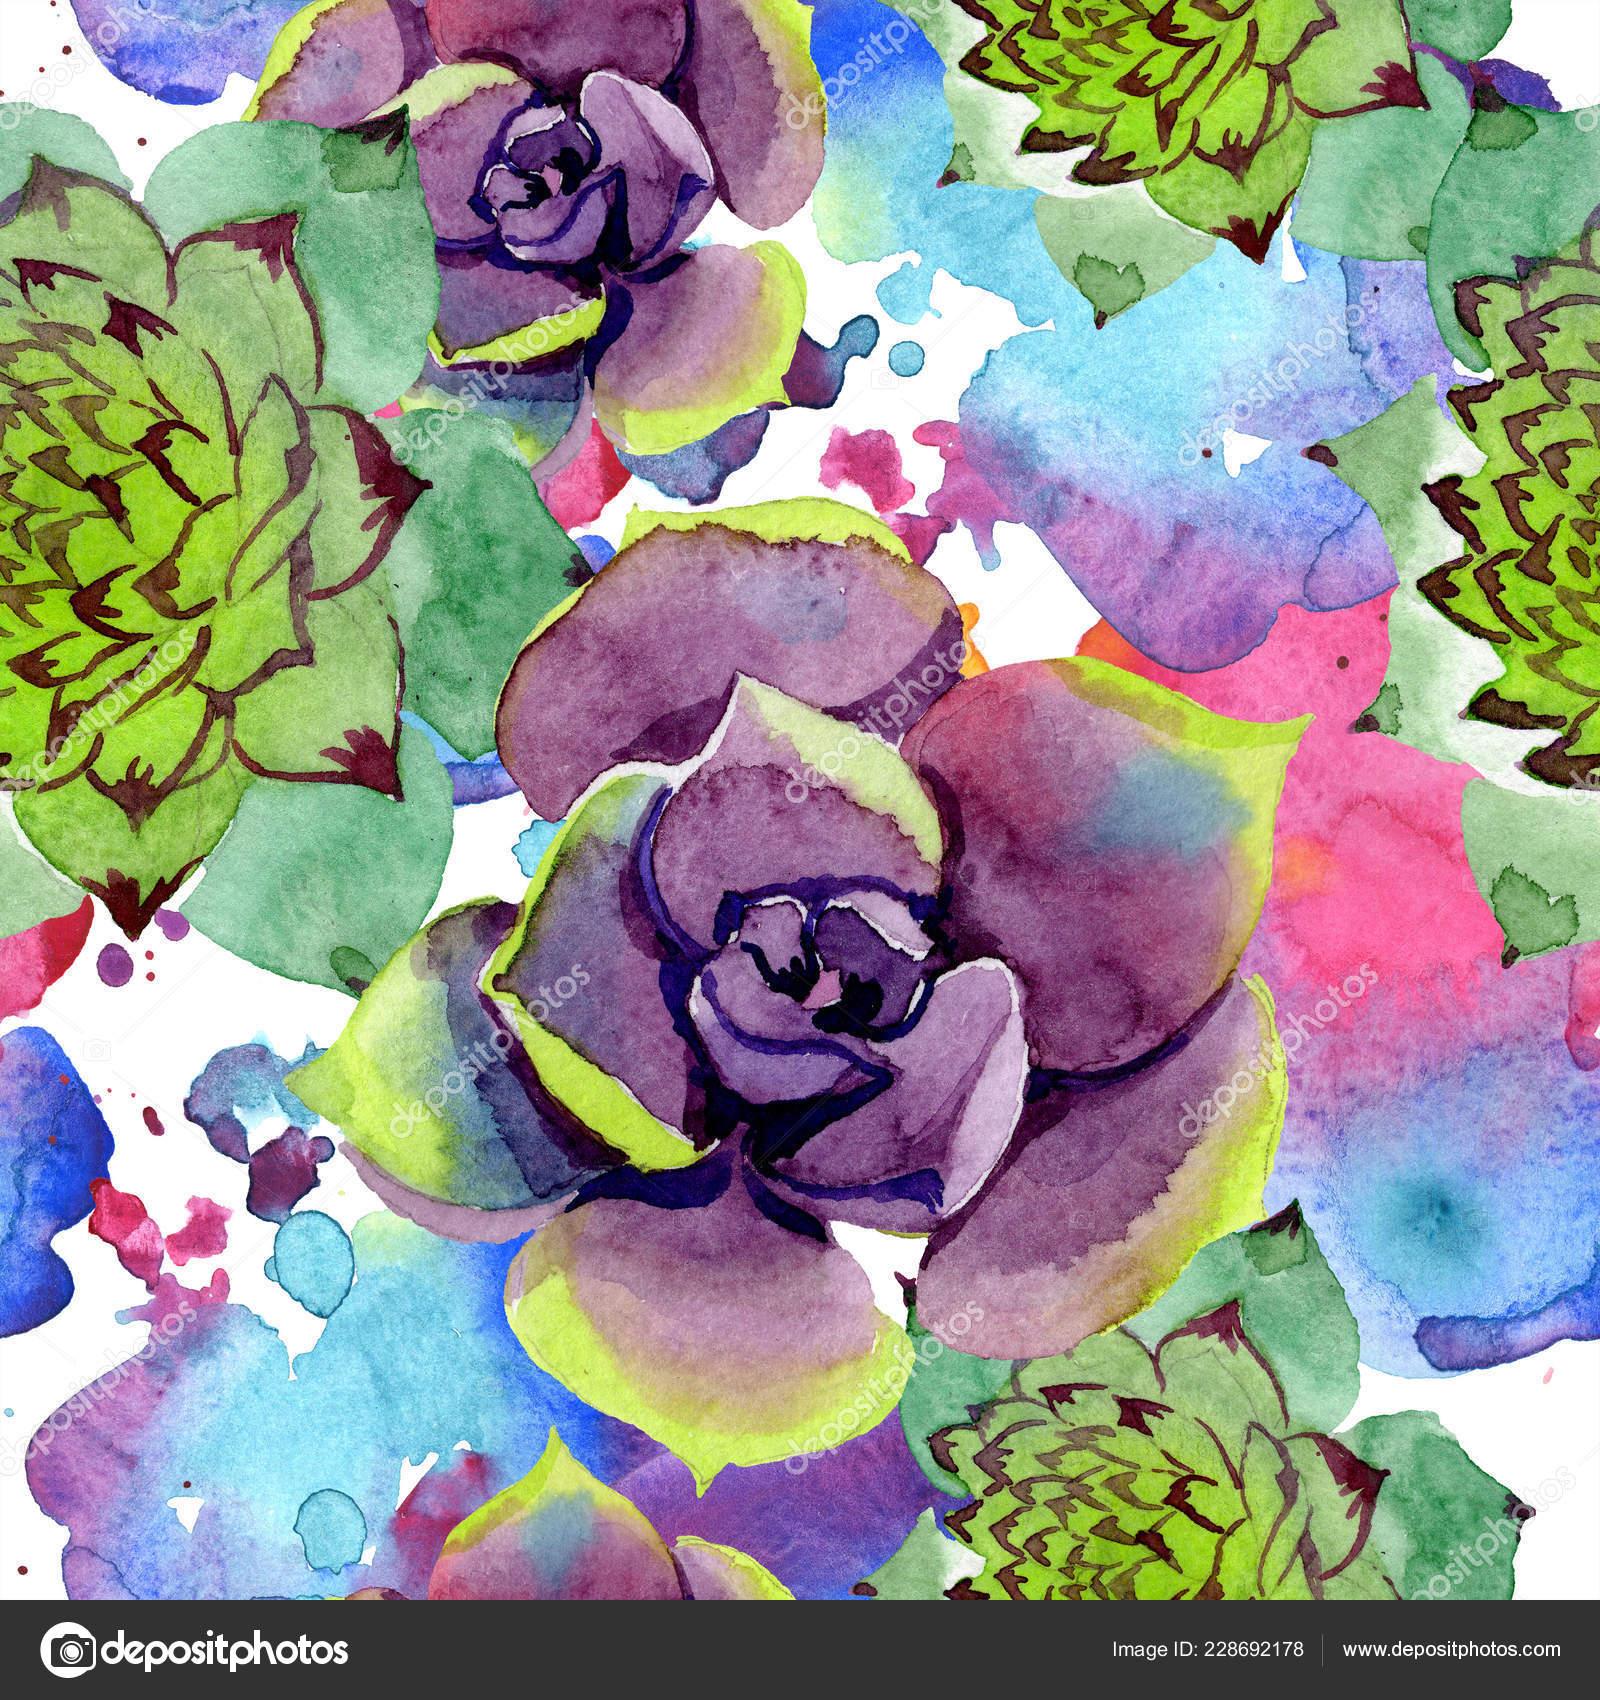 Succulent Pattern Fabric Amazing Succulents Watercolor Background Illustration Seamless Background Pattern Fabric Wallpaper Stock Photo C Andreyanush 228692178